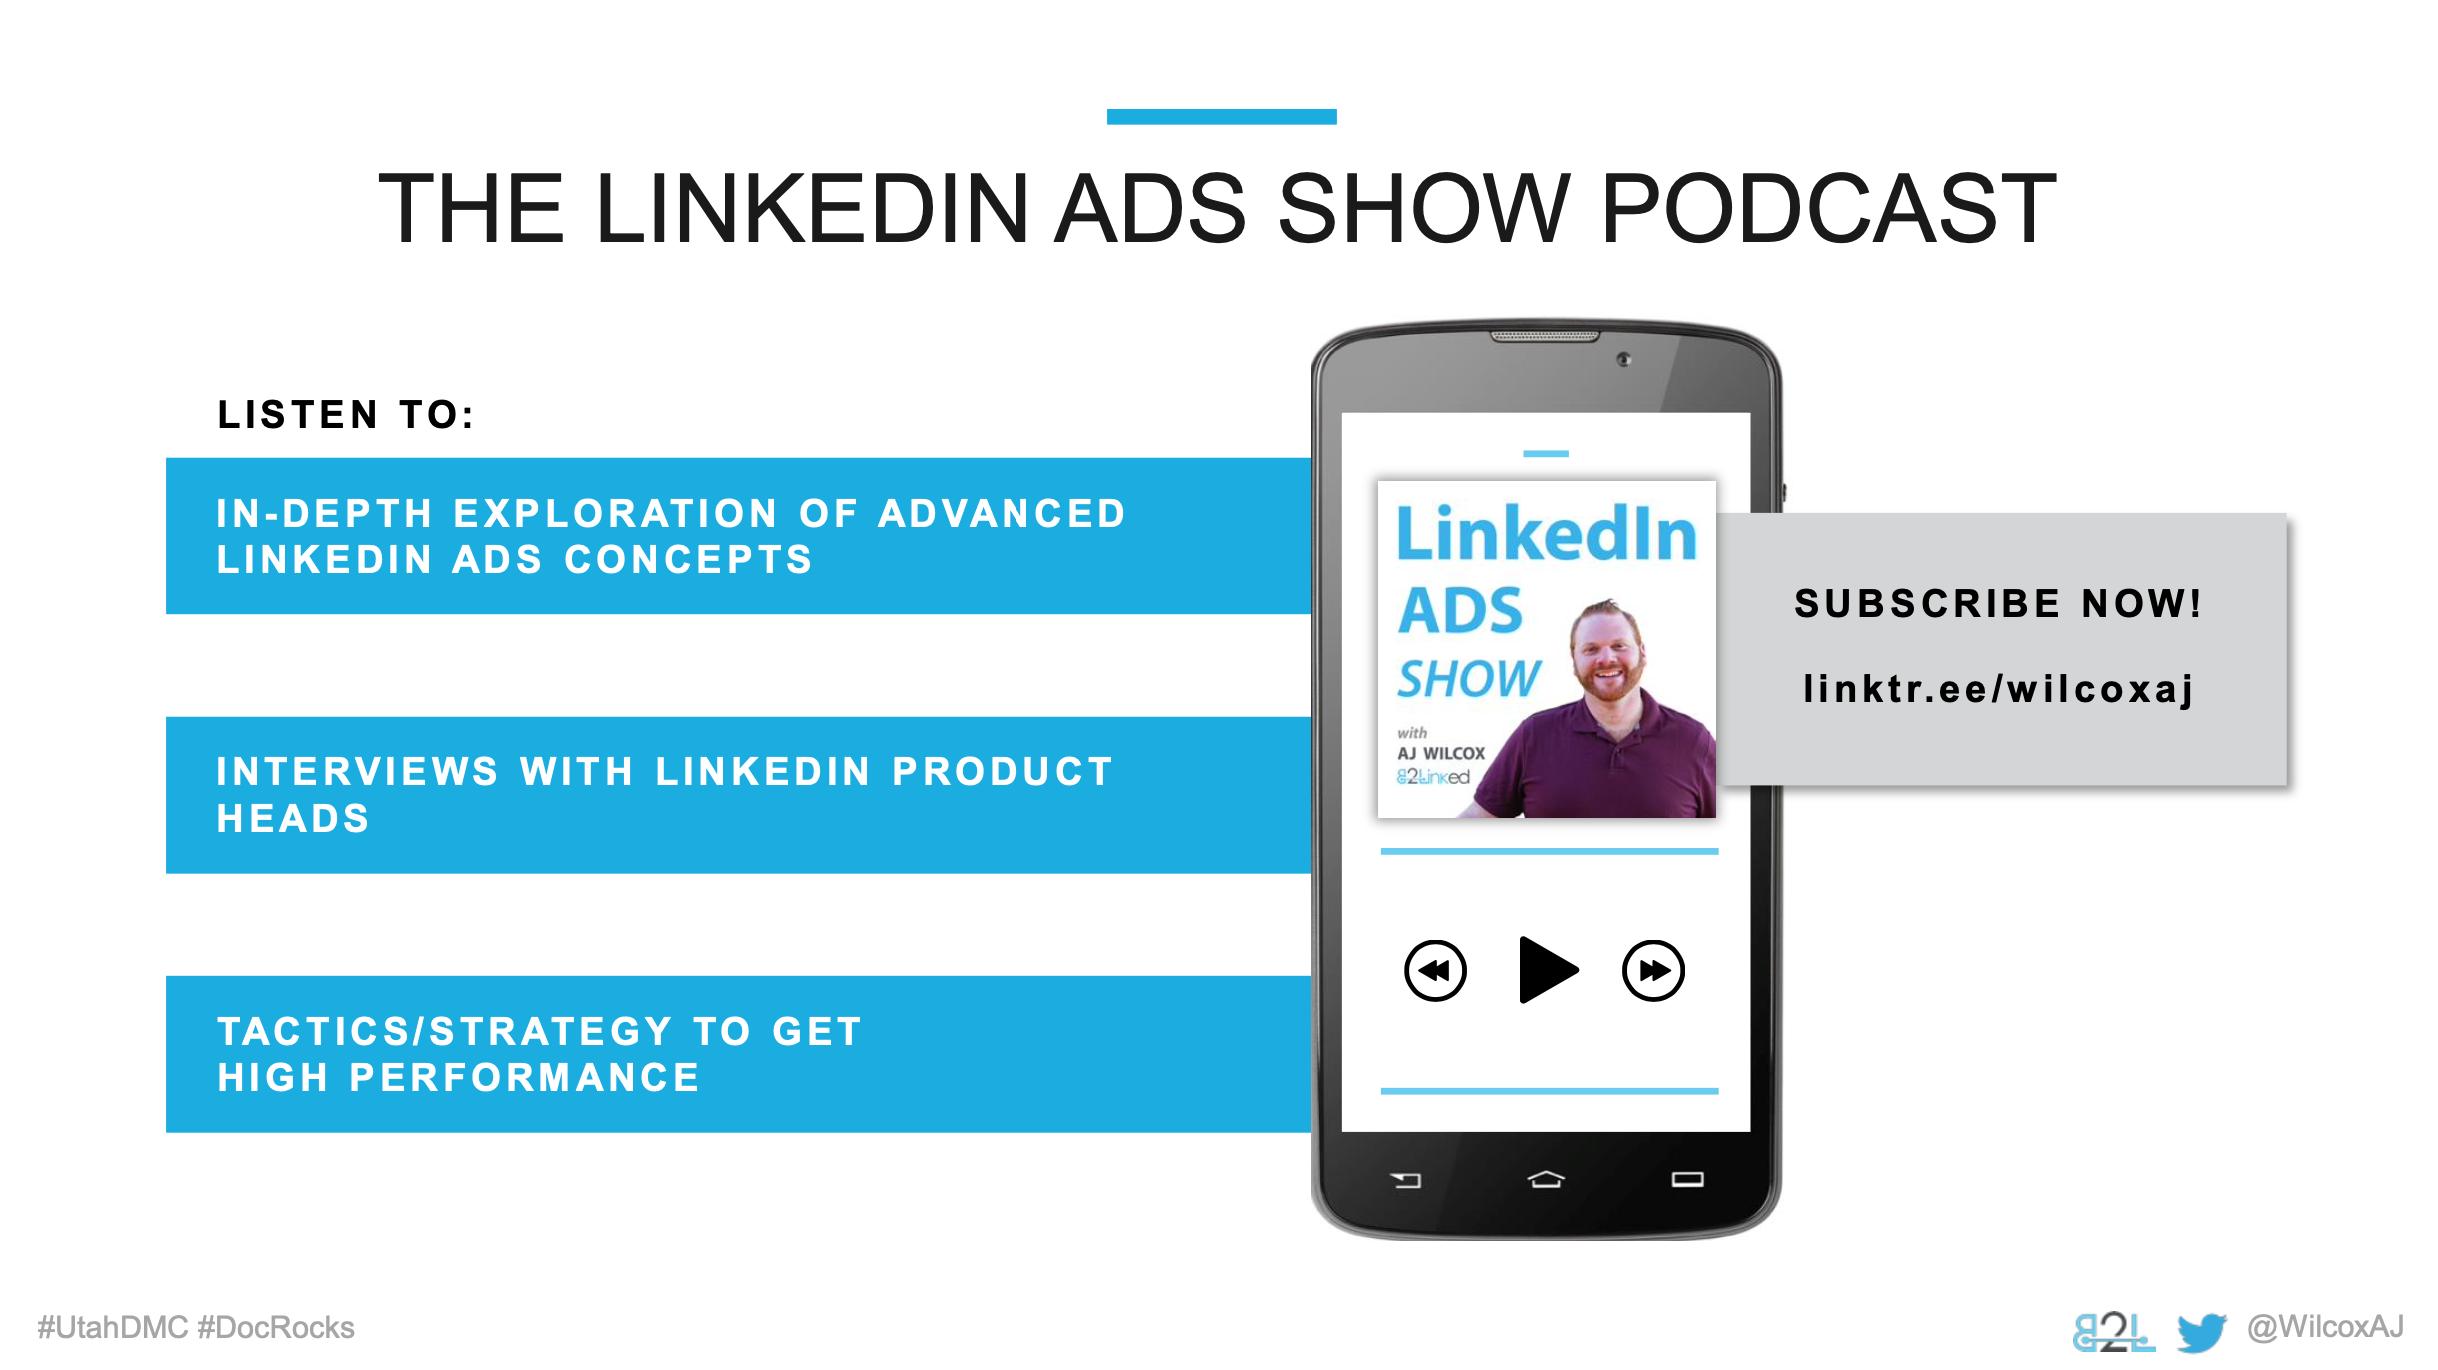 Utah DMC LinkedIn Ads - Aj Wilcox - Ad Units - LinkedIn Ads Show Podcast